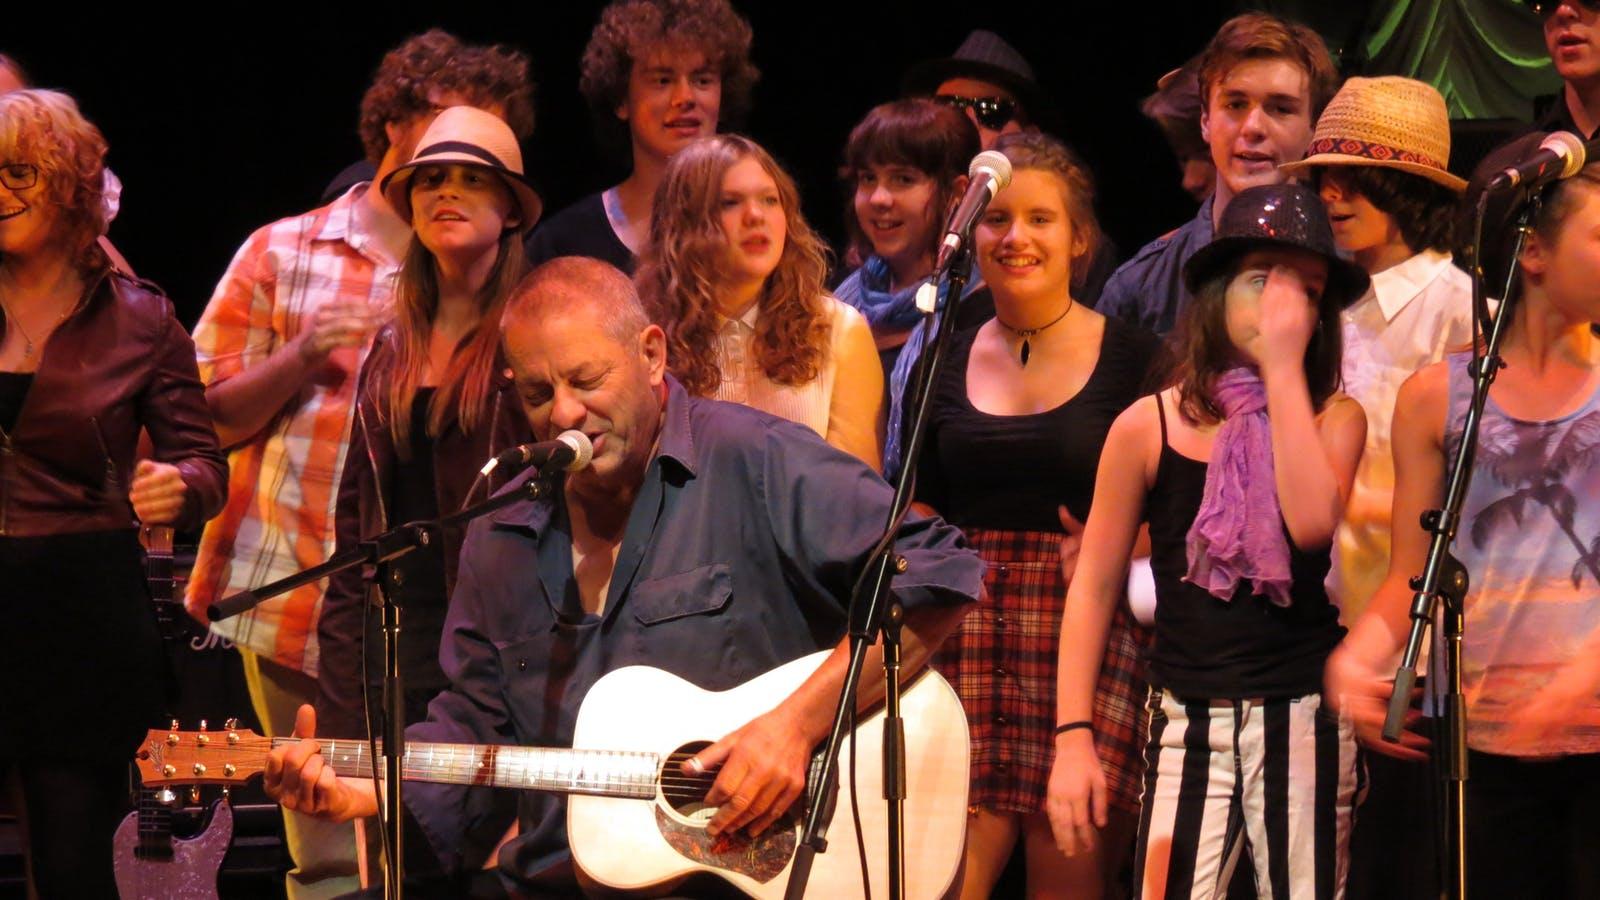 Local Bellarine musician Chris Wilson performing with community